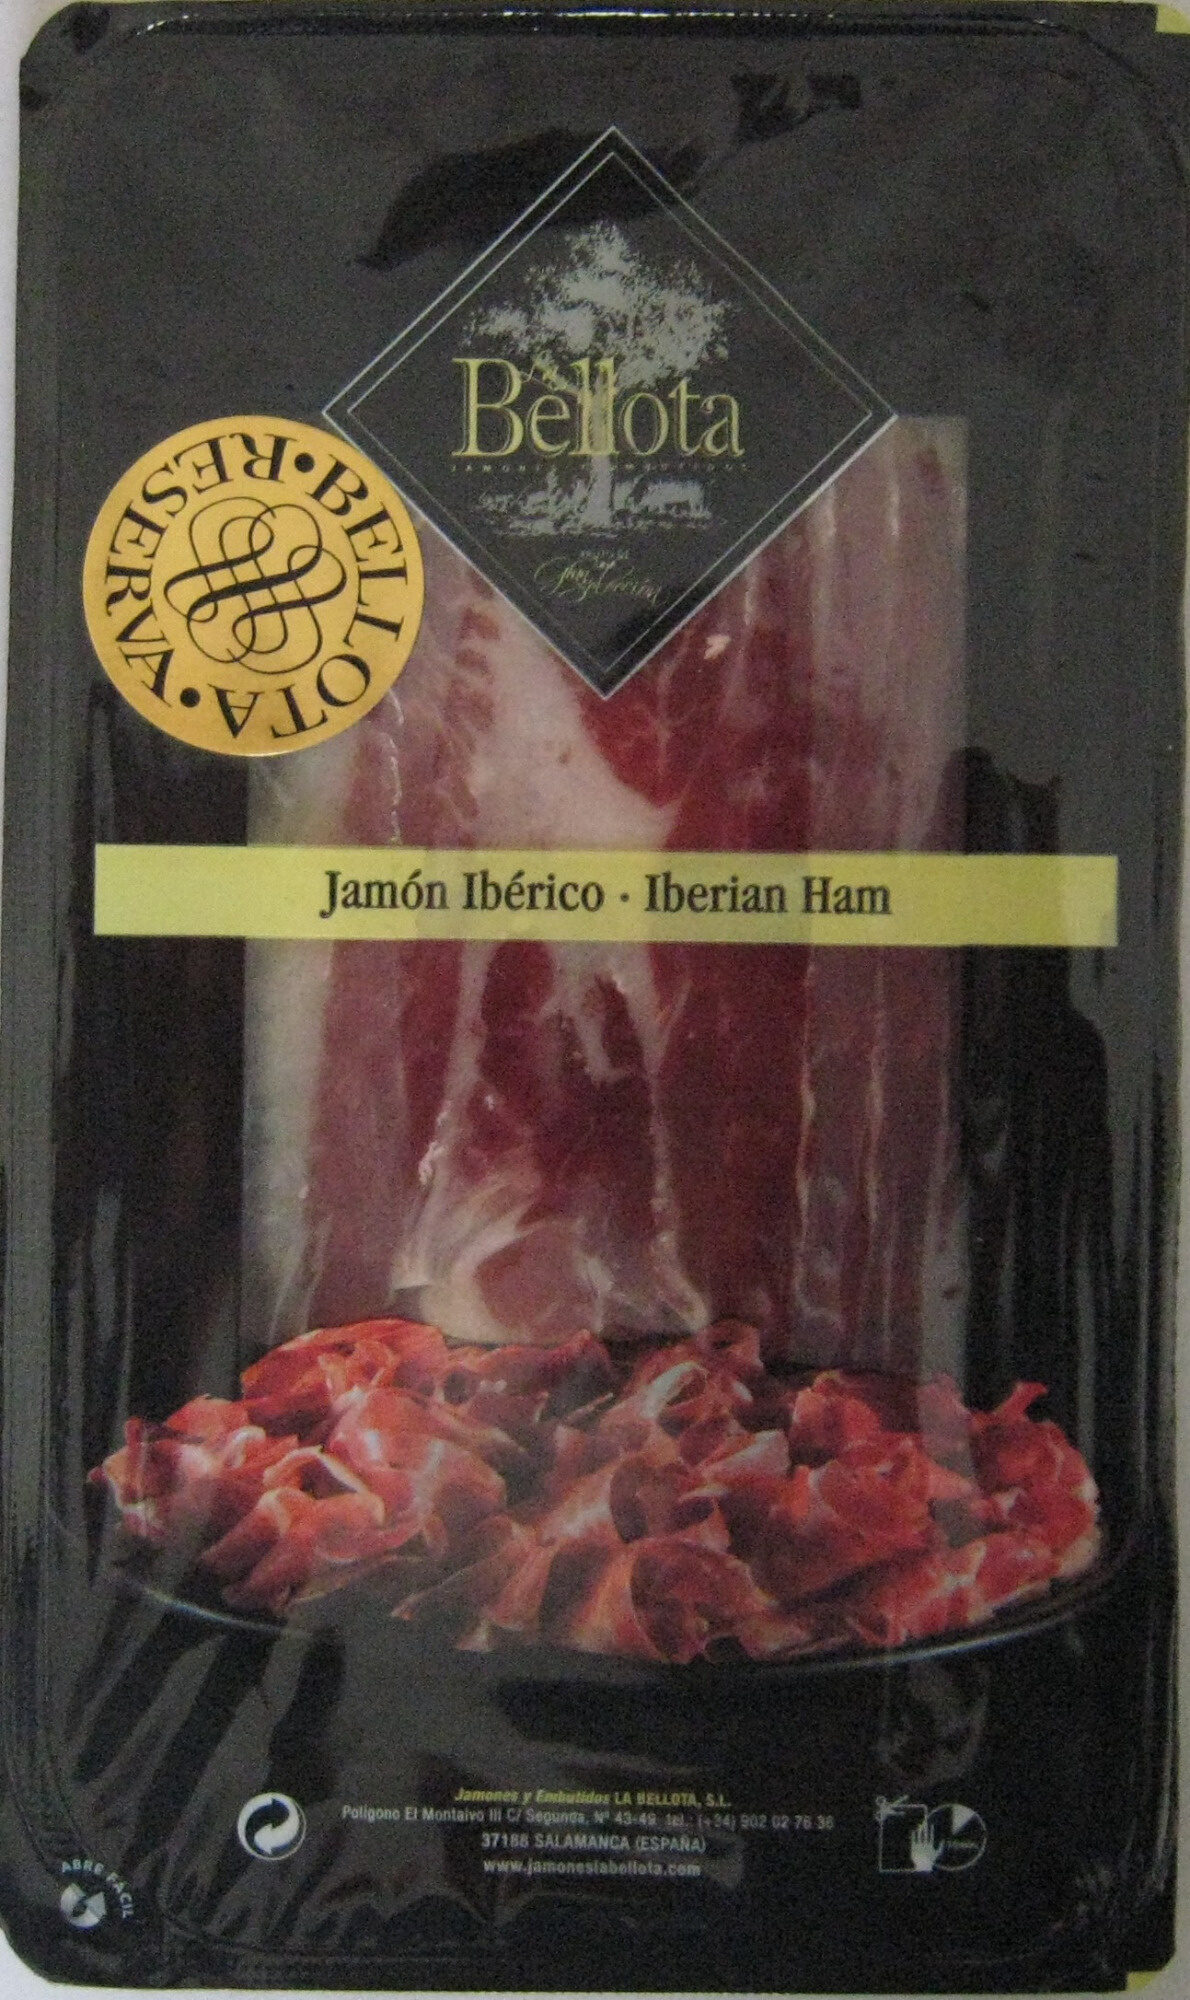 Jamón Ibérico 100 g de Bellota - Produit - es